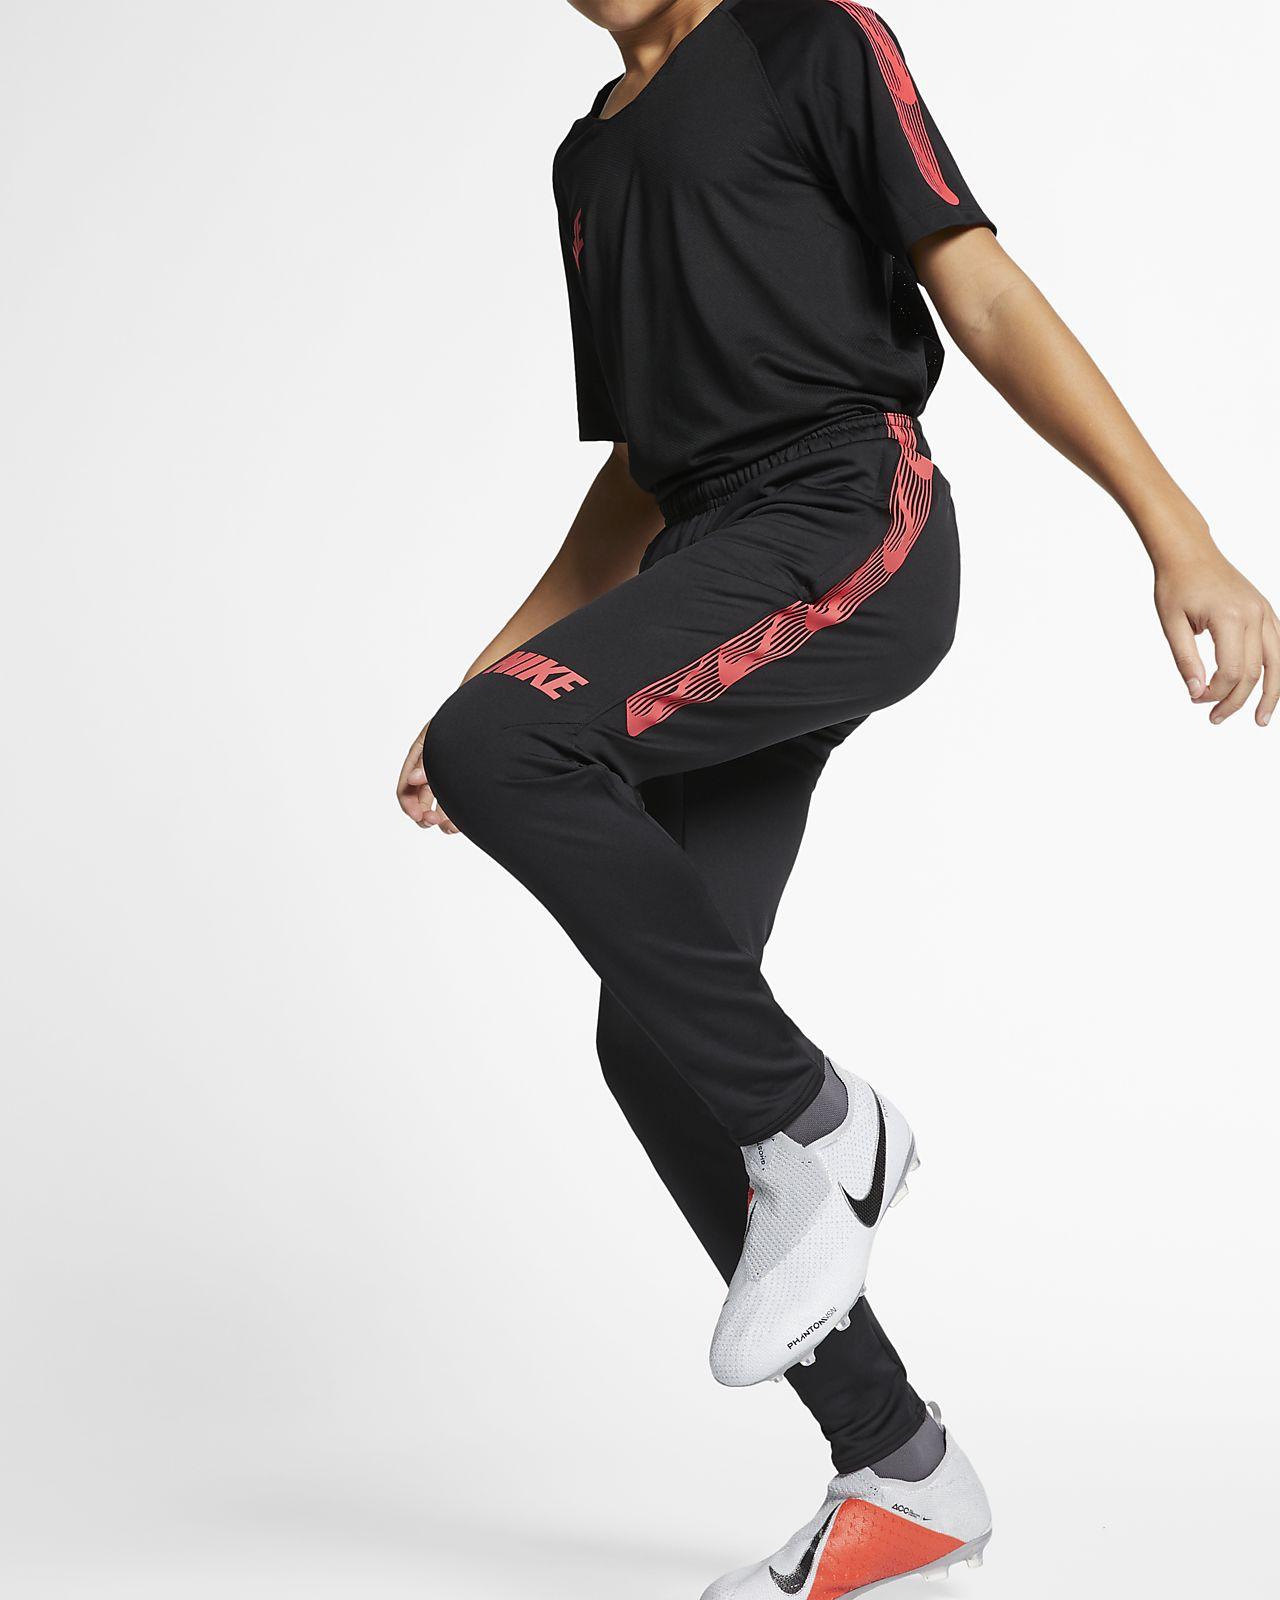 Pantalones de fútbol para niños talla grande Nike Dri-FIT Squad ... 5c66ba20e35c3